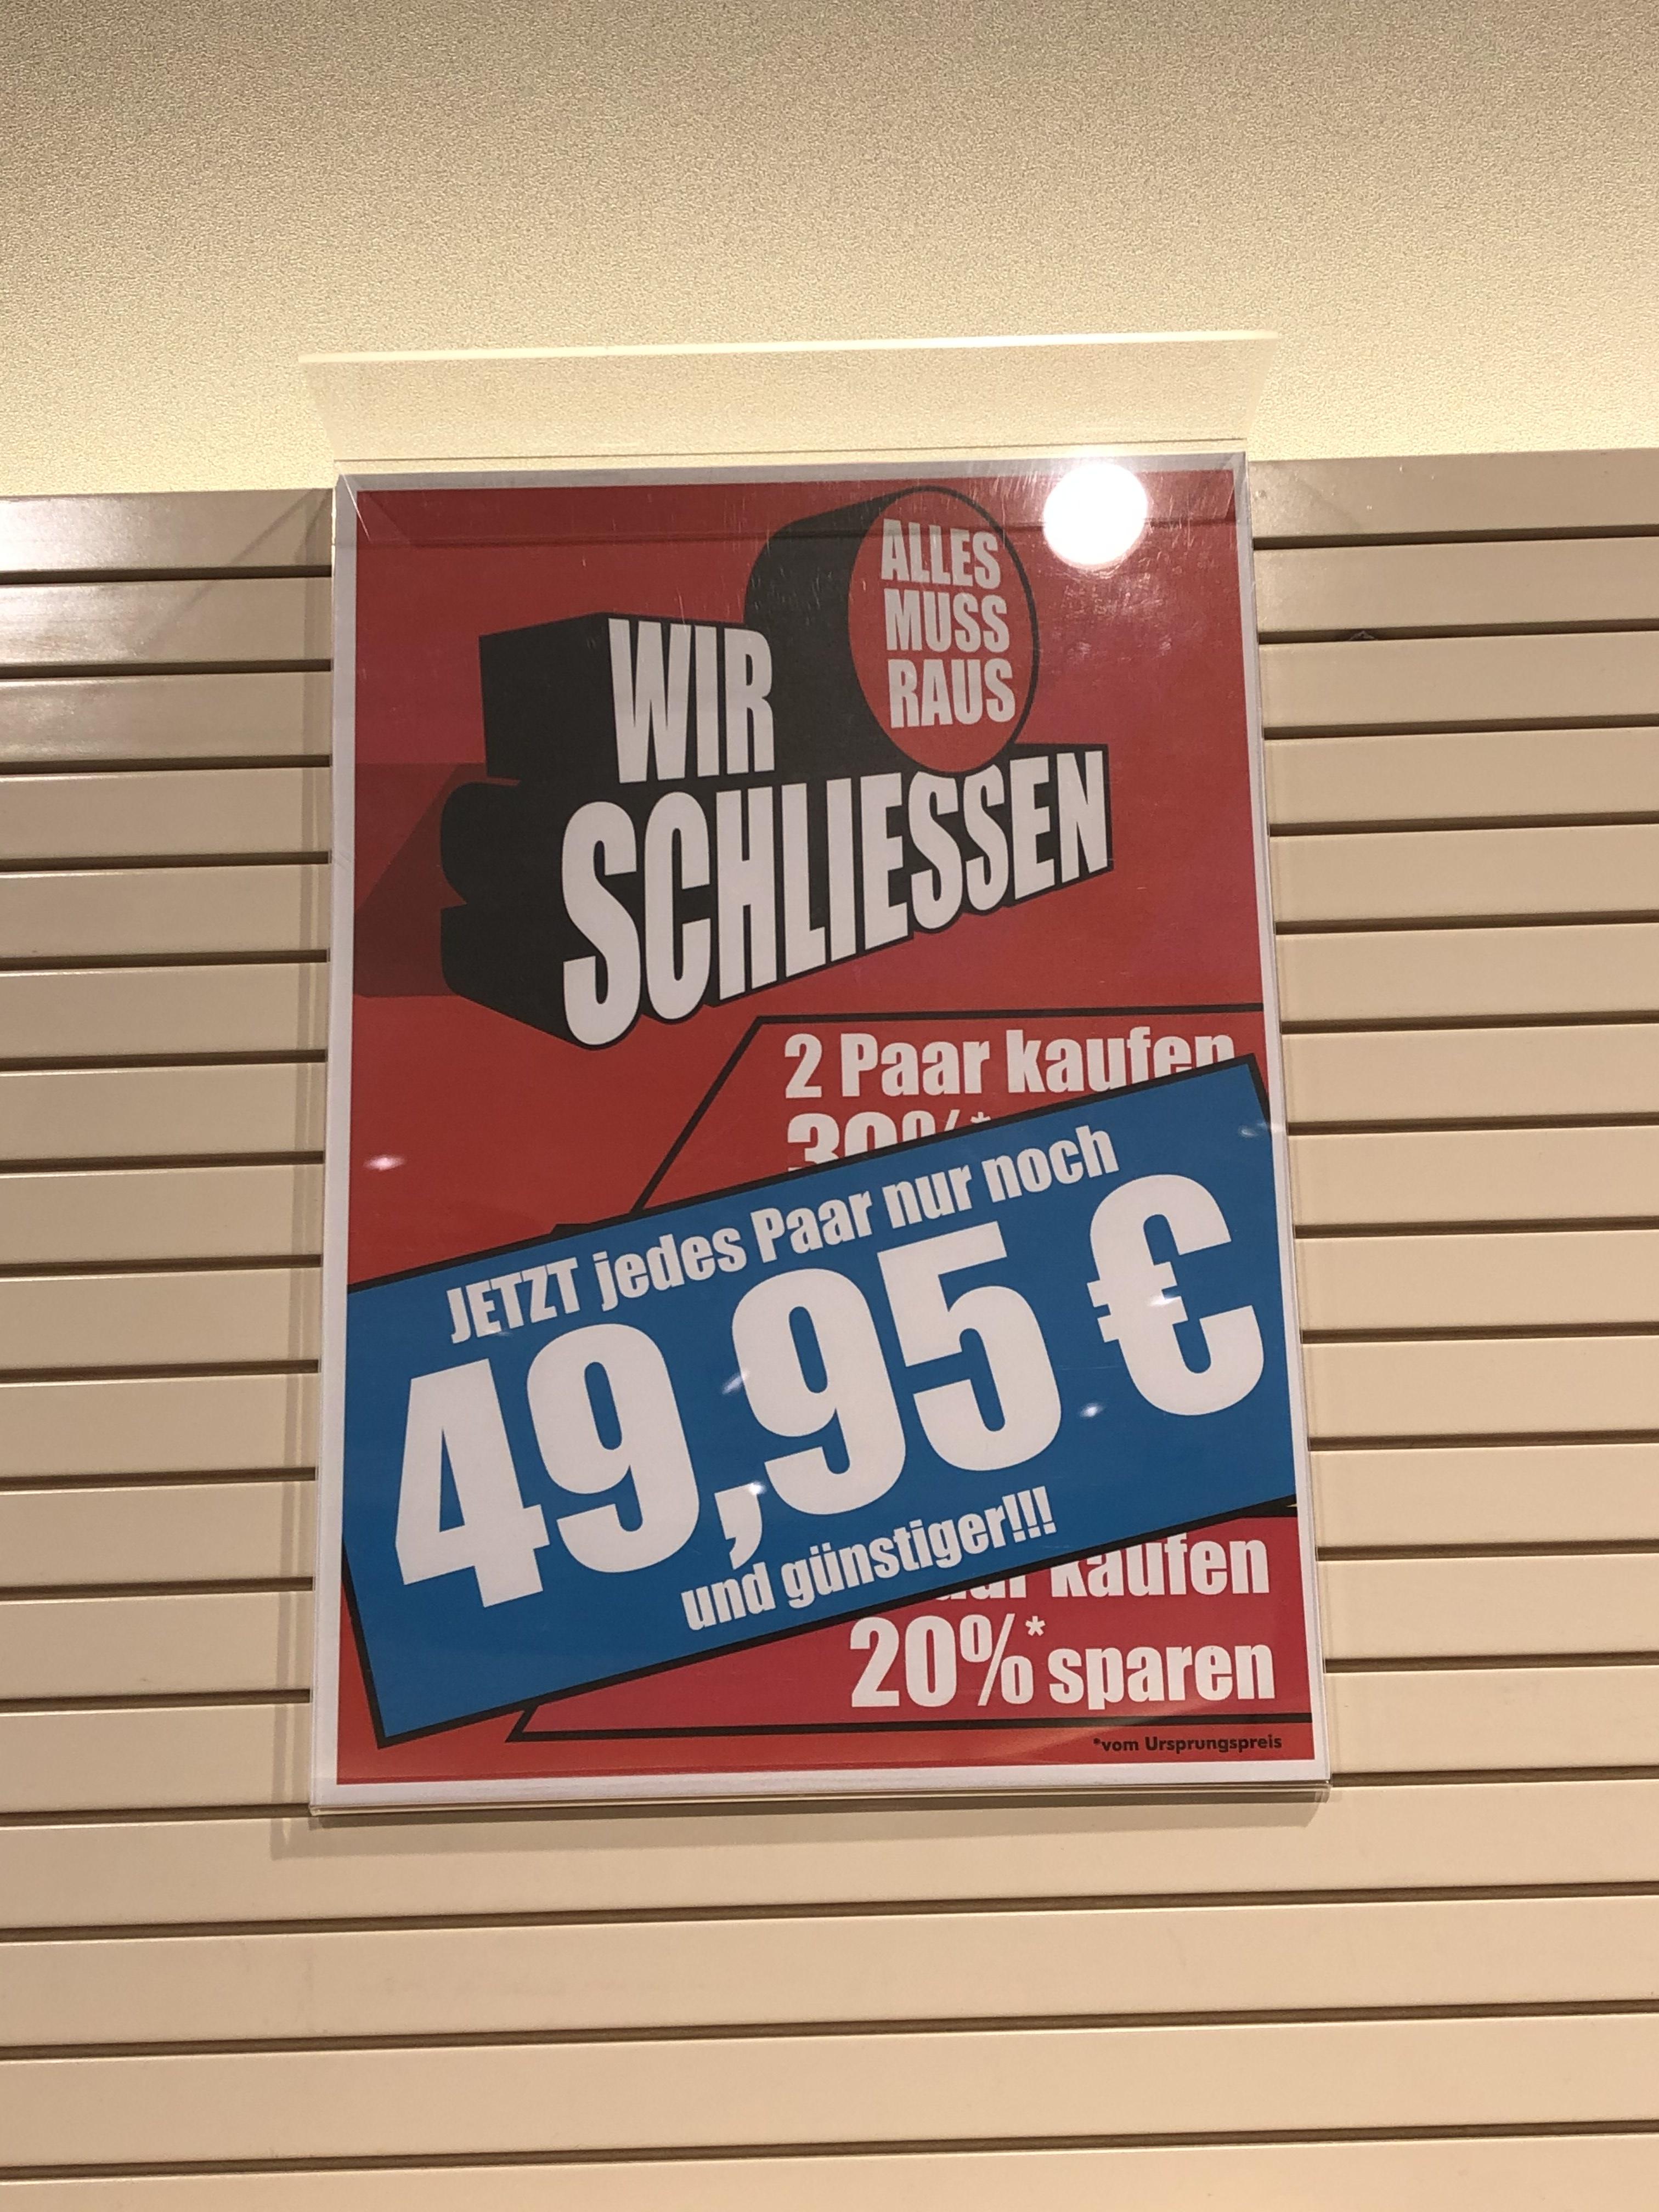 [Lokal] Ausverkauf bei Leiser - jedes Paar 49,95€